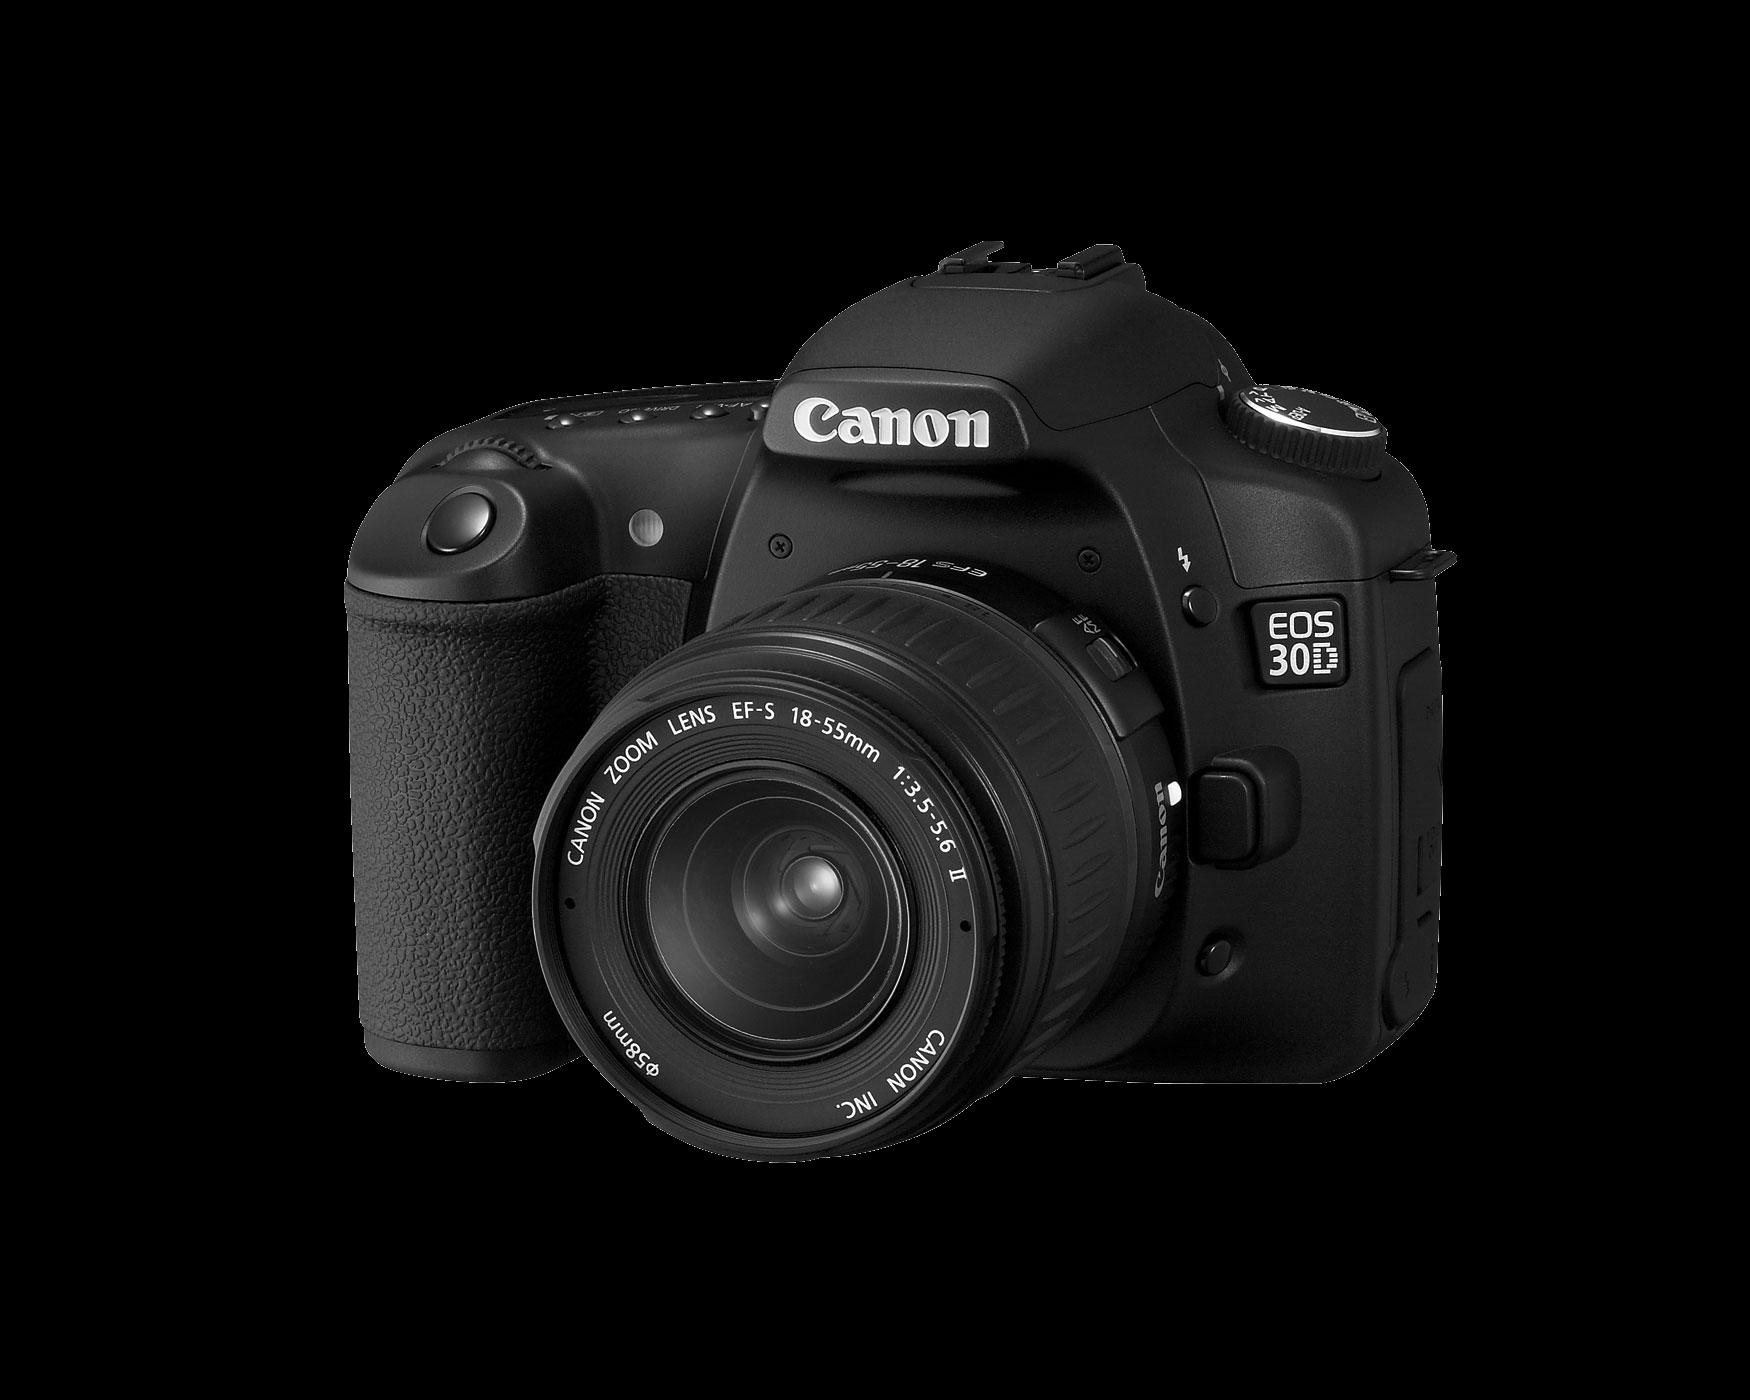 Canon Eos 30 Photo Camera